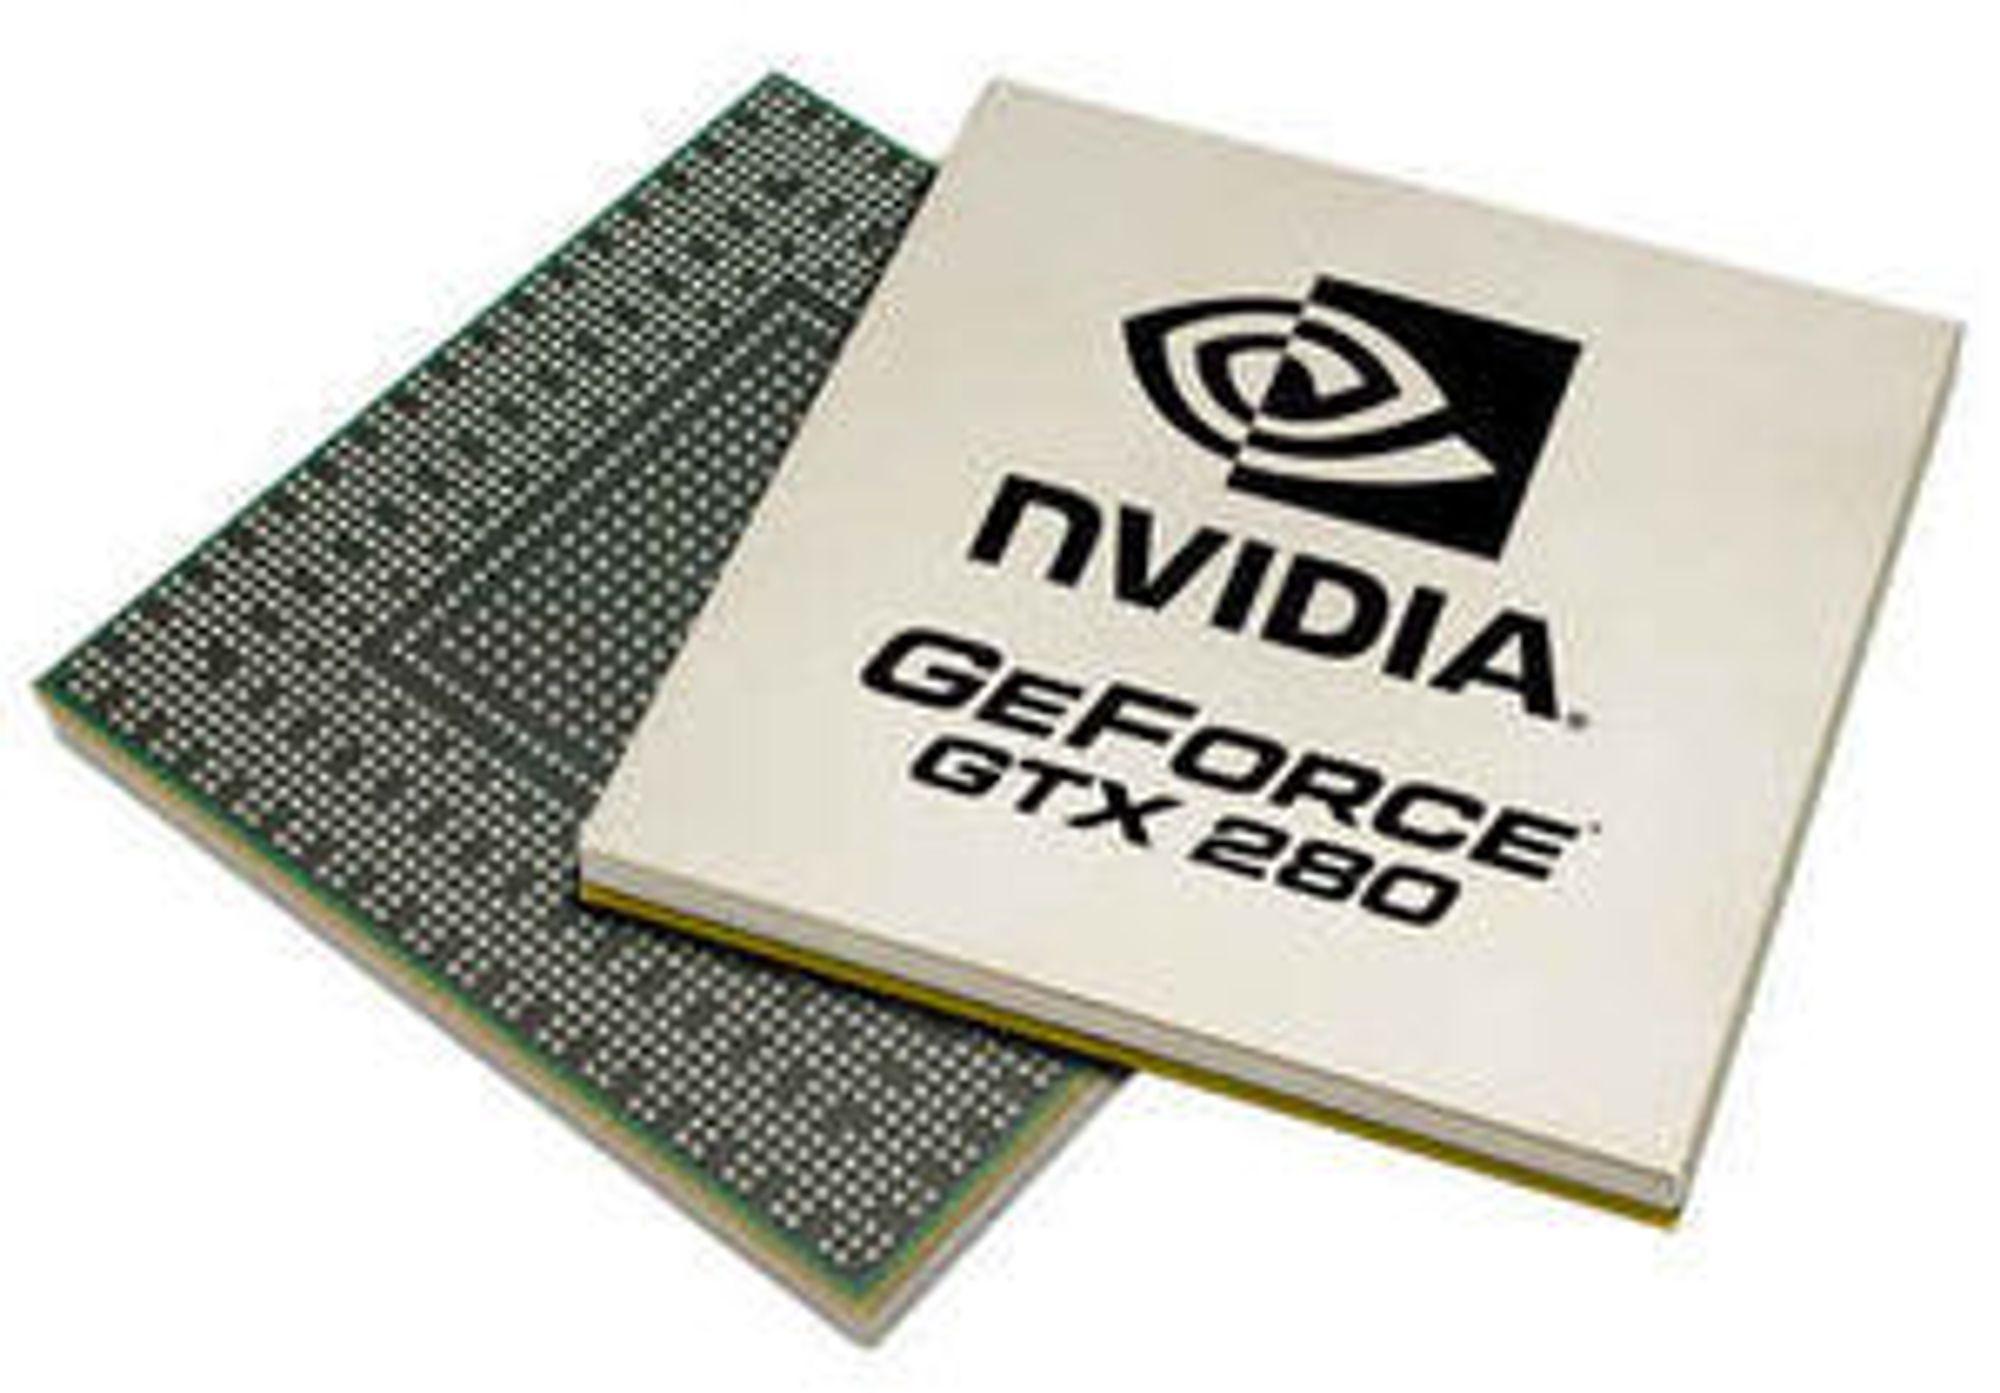 Nvidia GeForce GTX 280-brikke